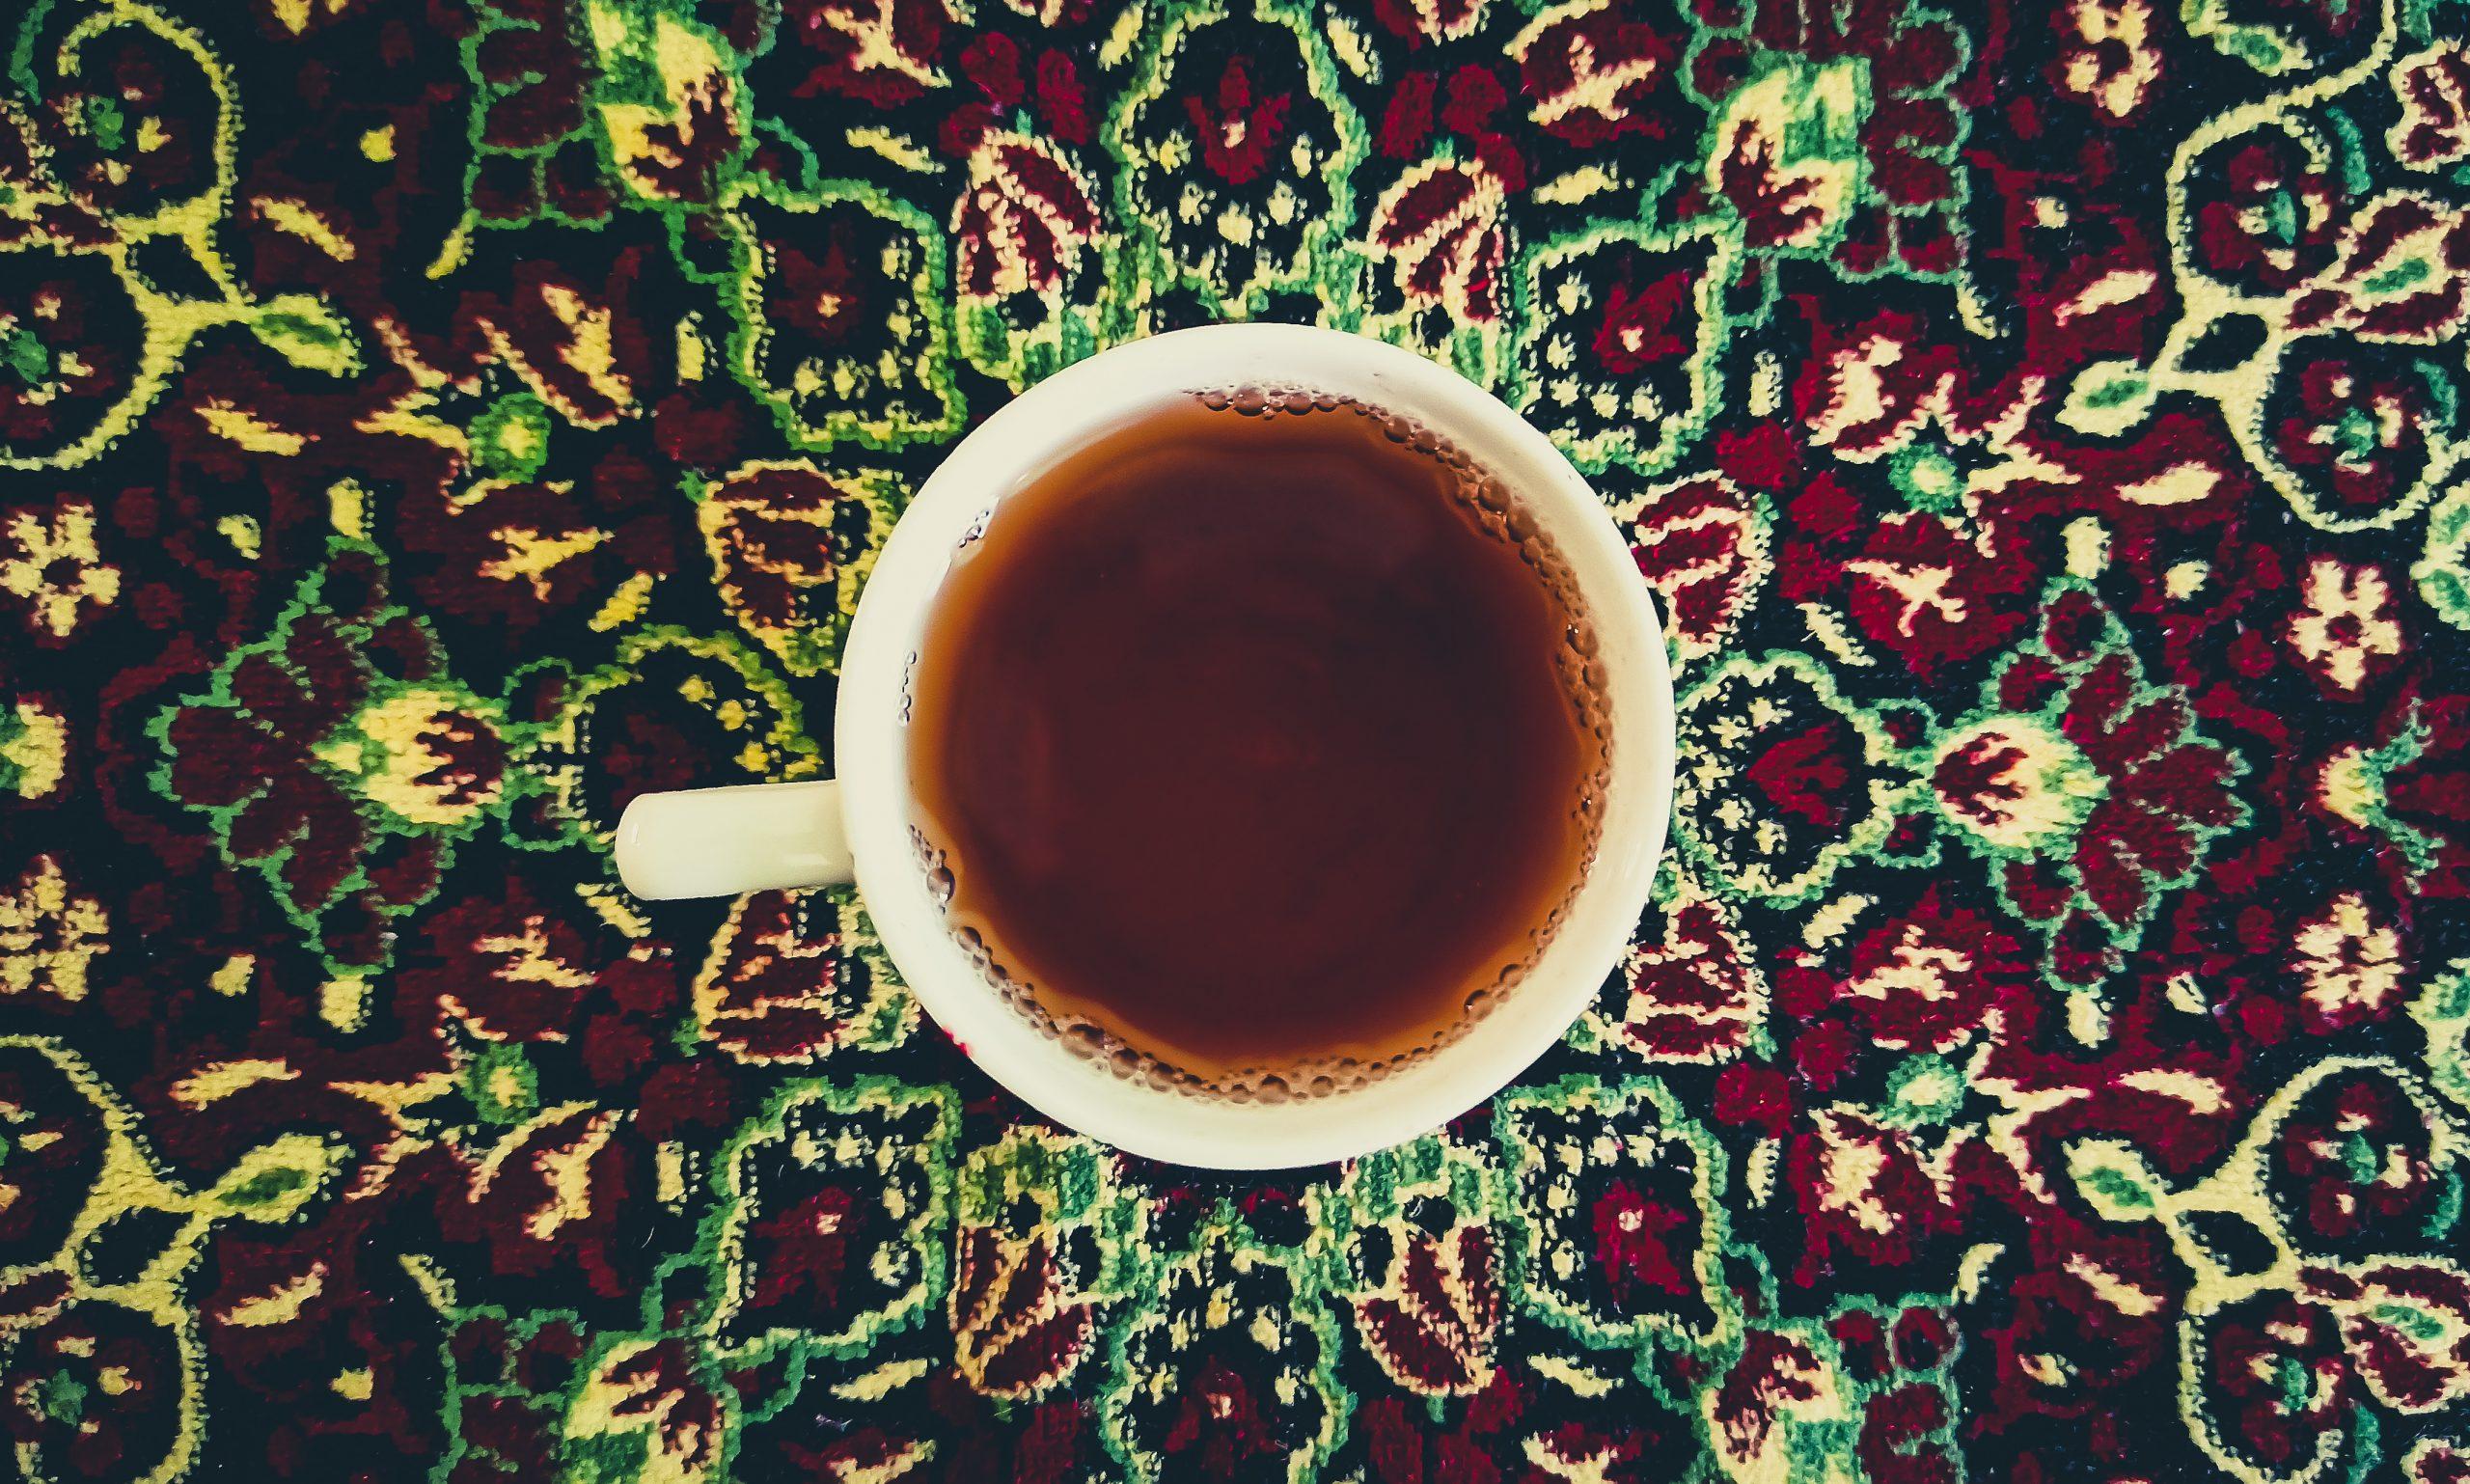 Black tea in cup